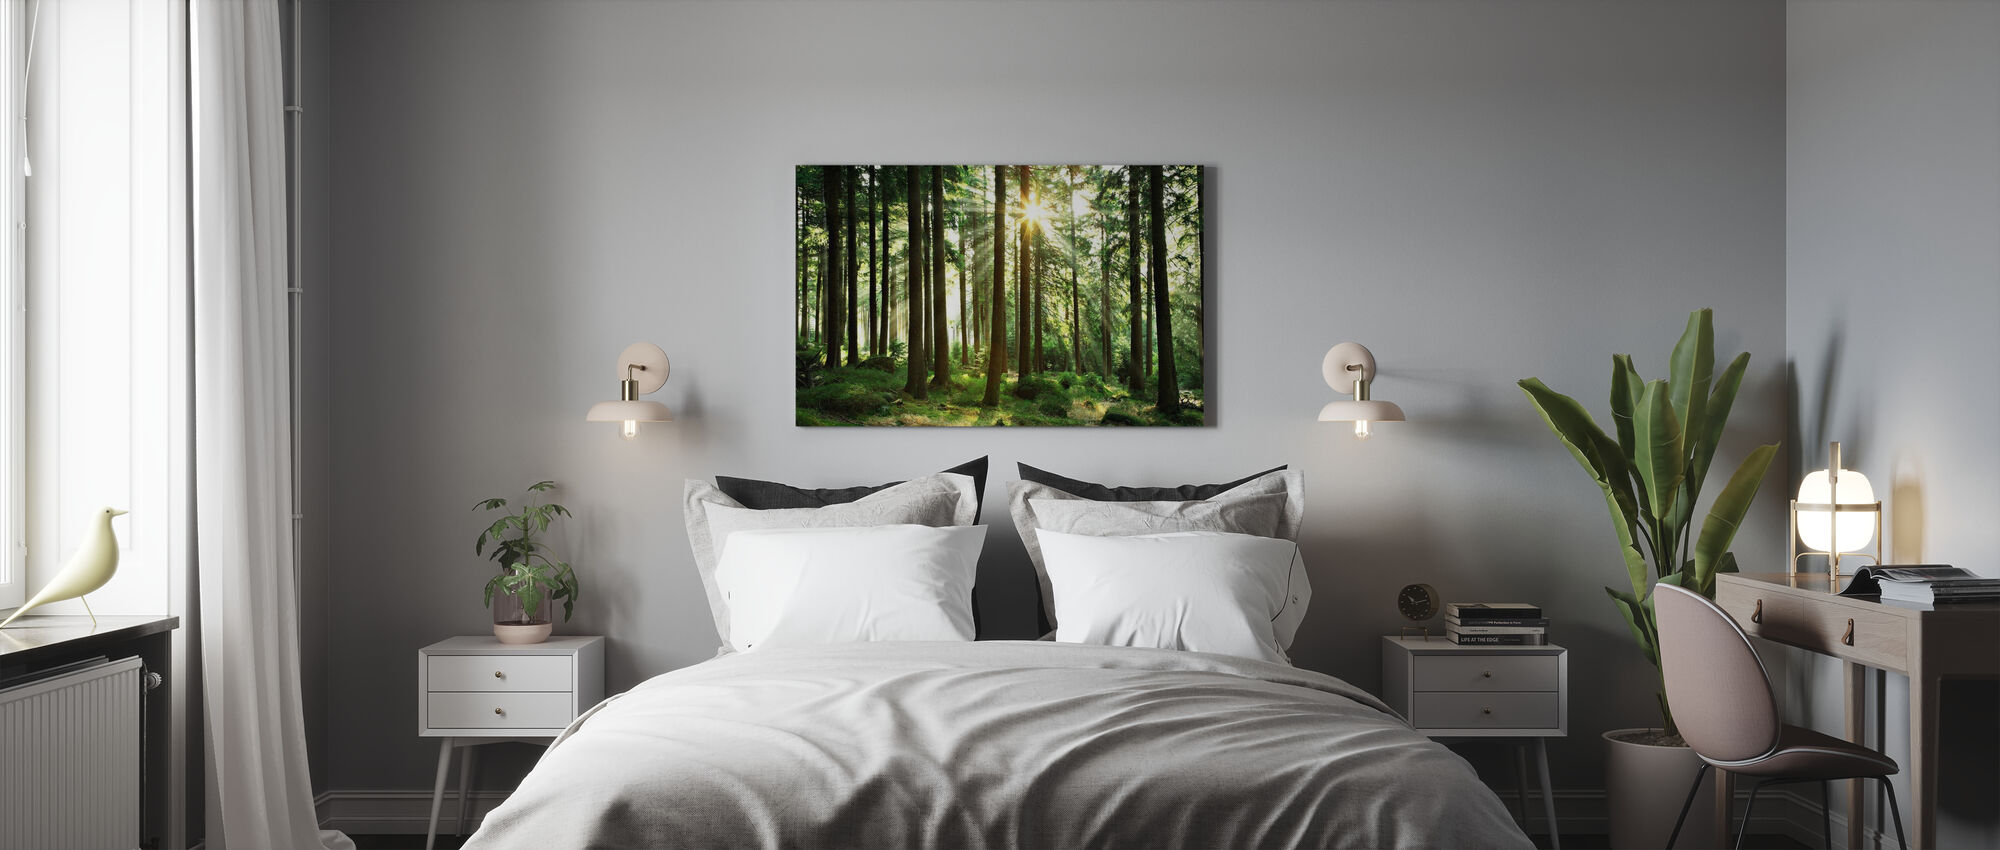 Sunbeam through Trees - Canvas print - Bedroom